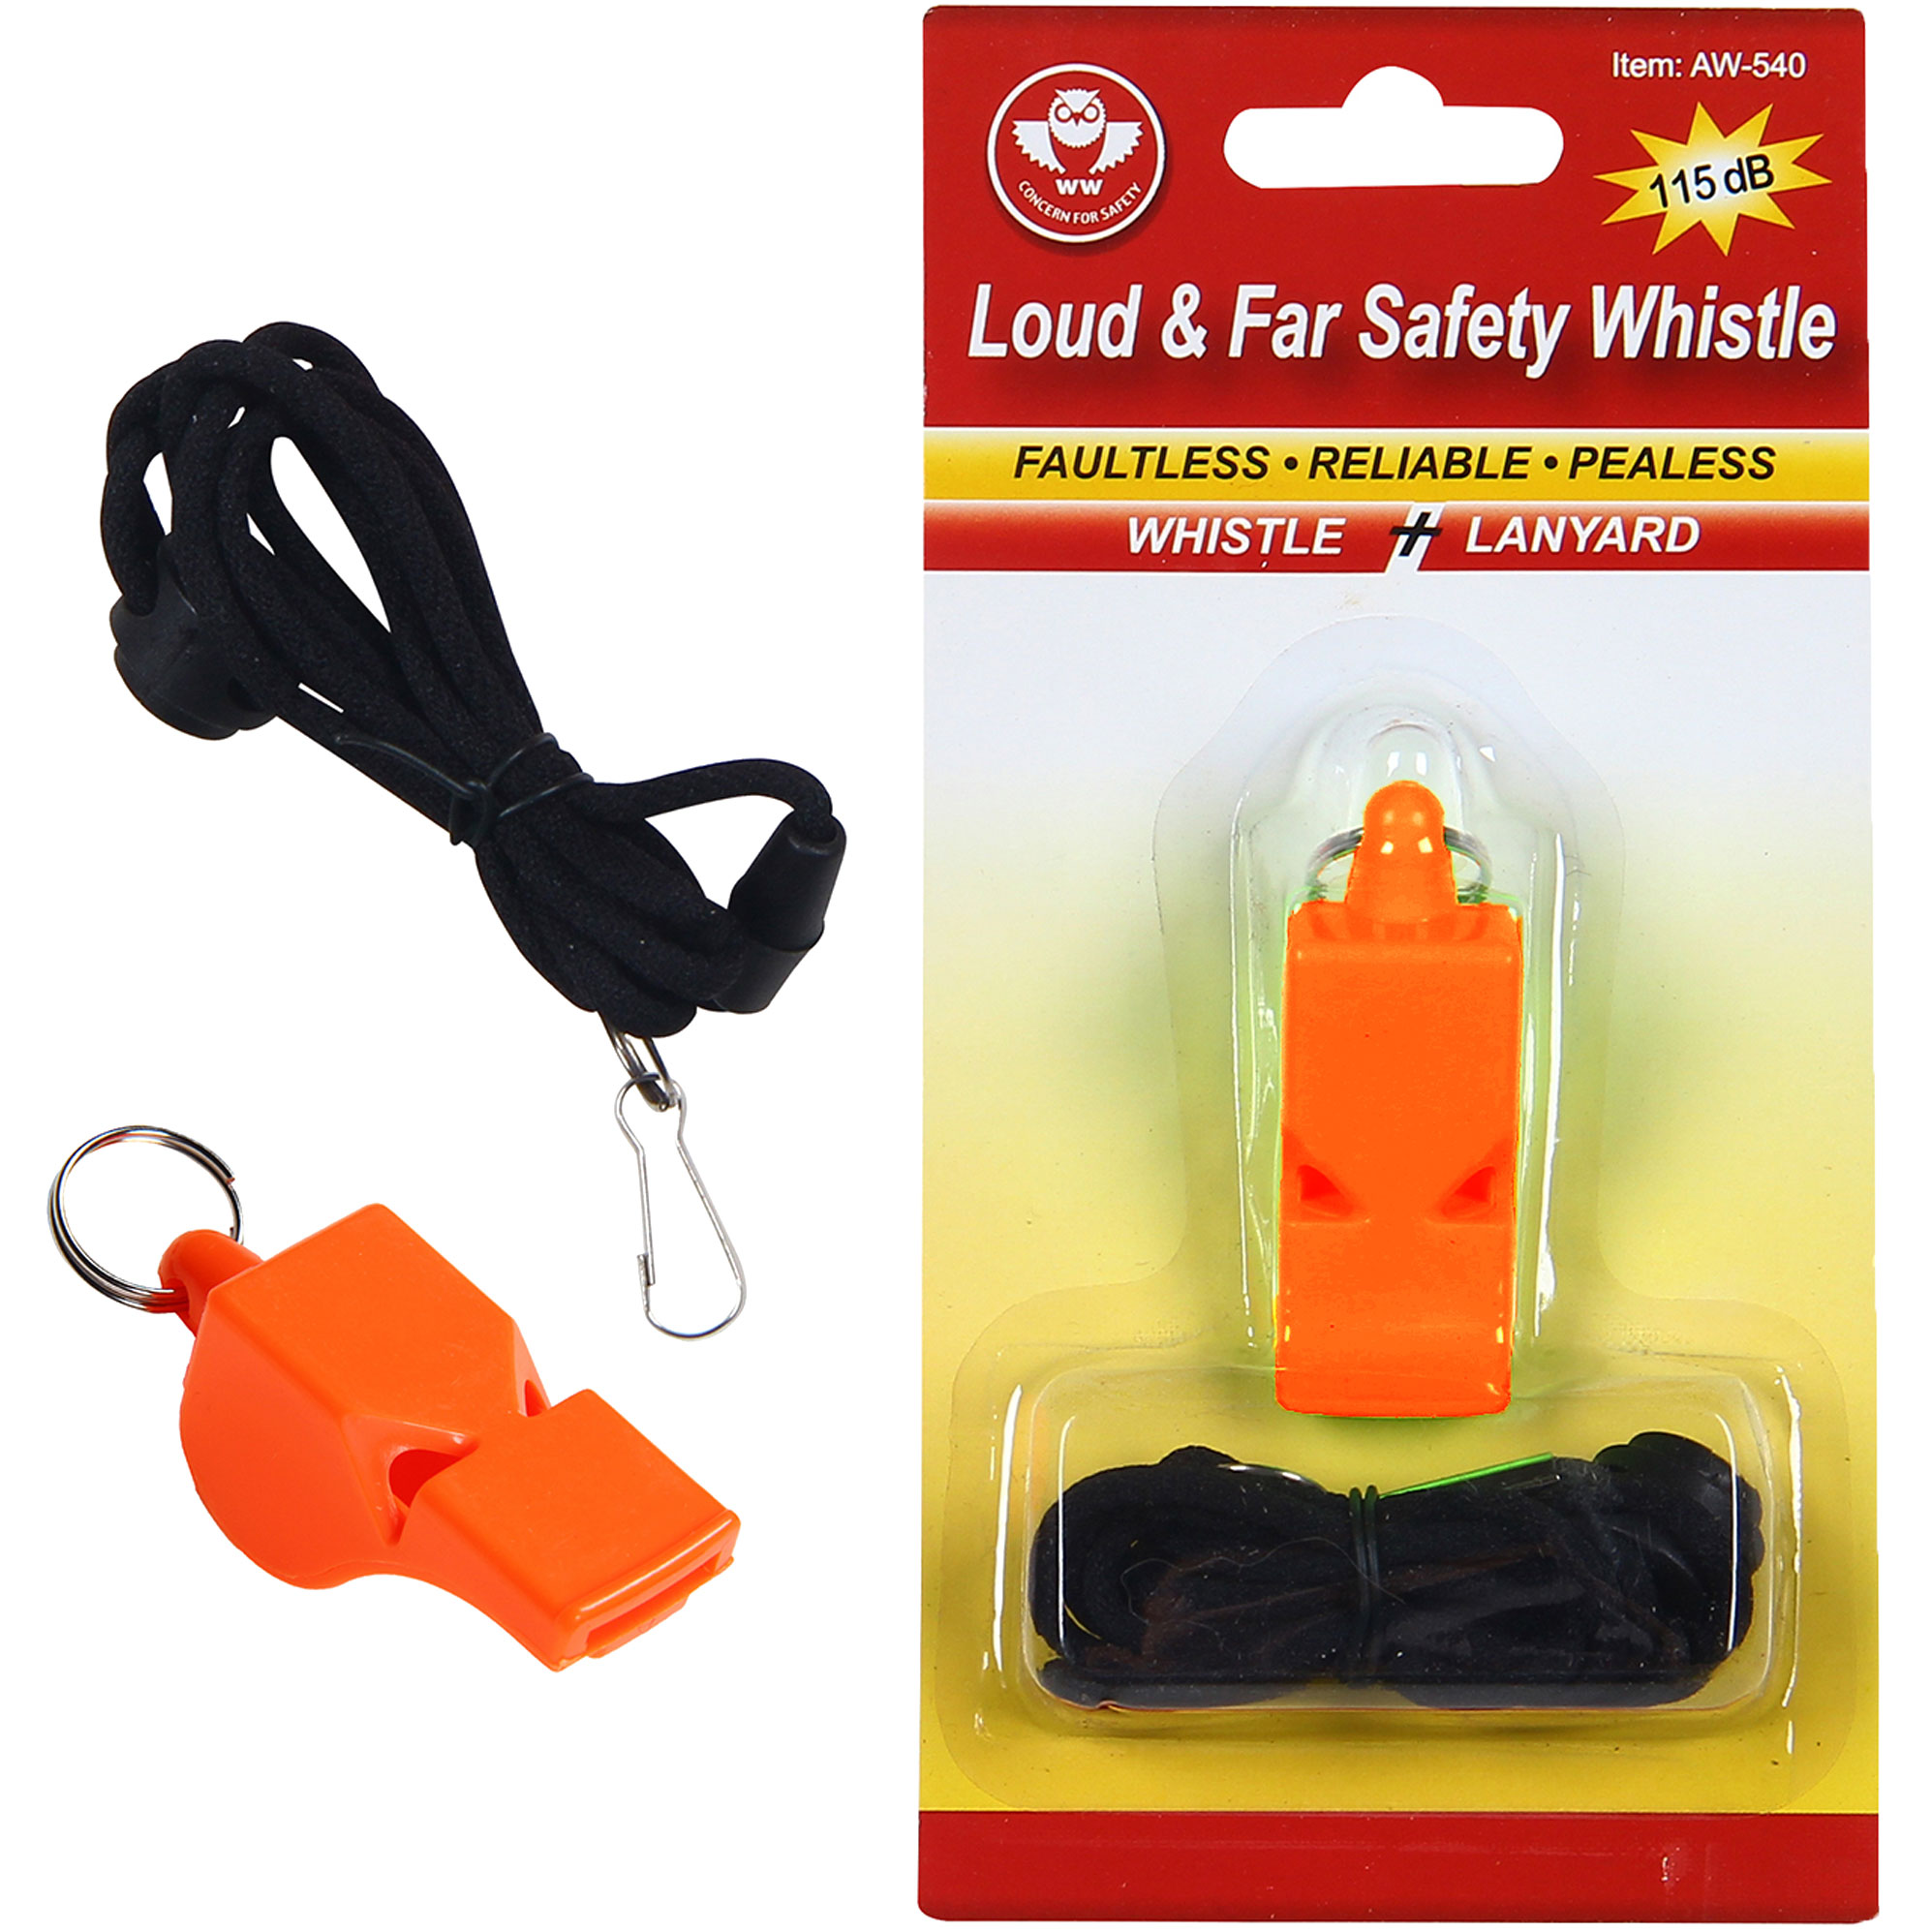 Loud & Far Safety Whistle-